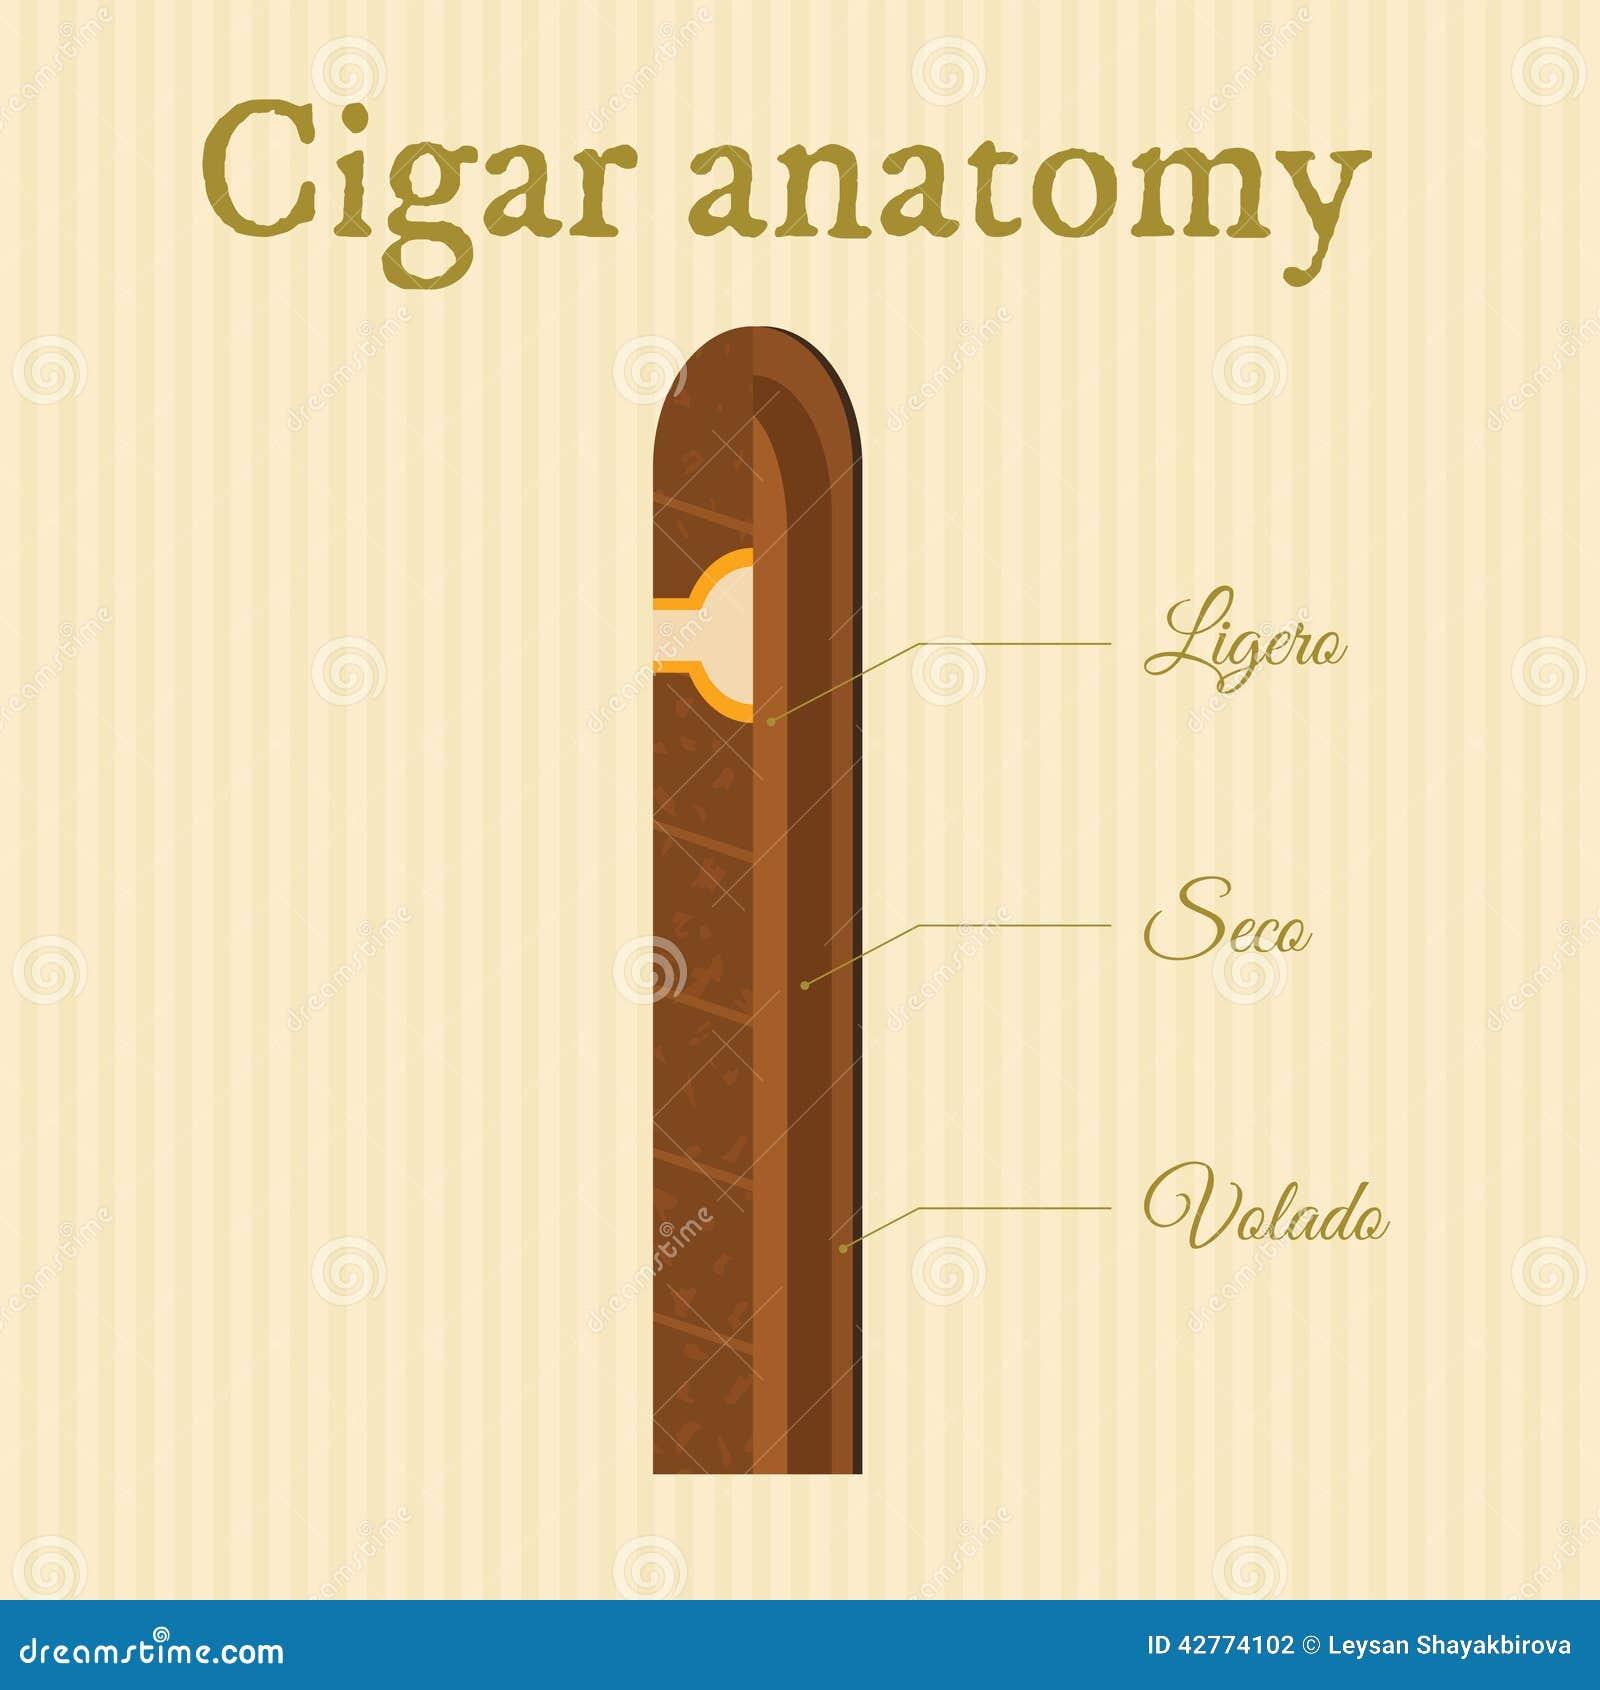 Cigar anatomy stock vector. Illustration of label, illustration ...